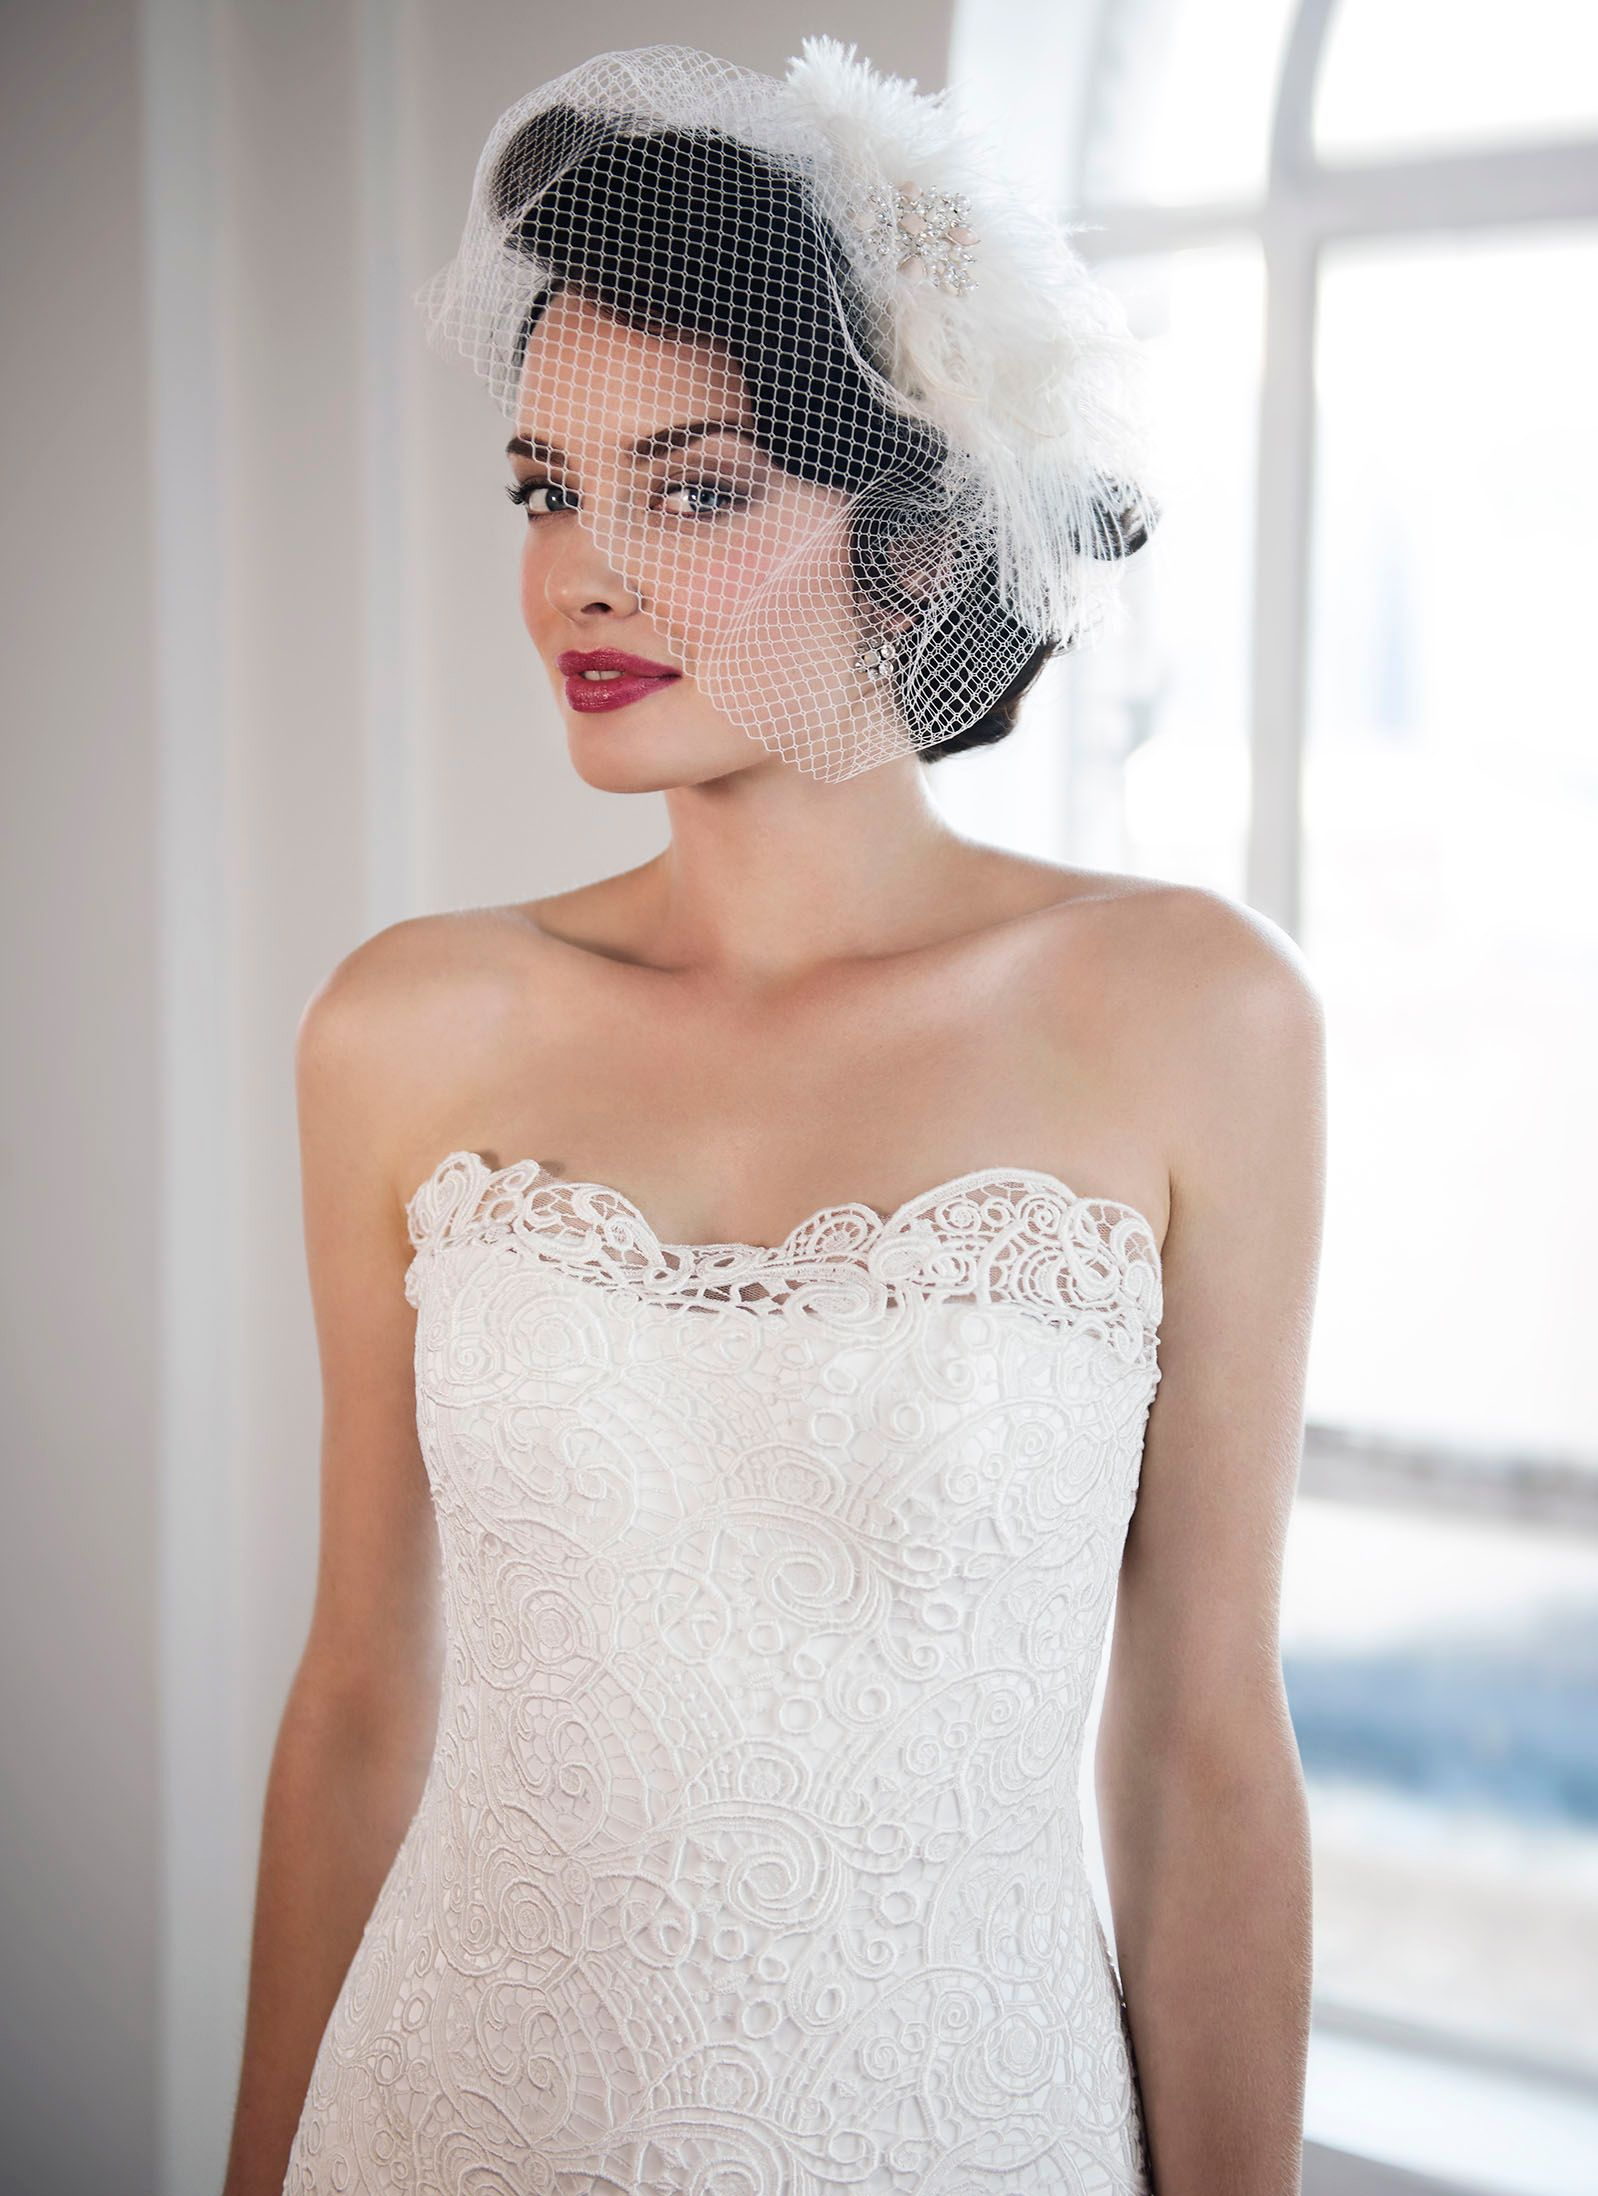 Medium Crop Of Crochet Wedding Dress